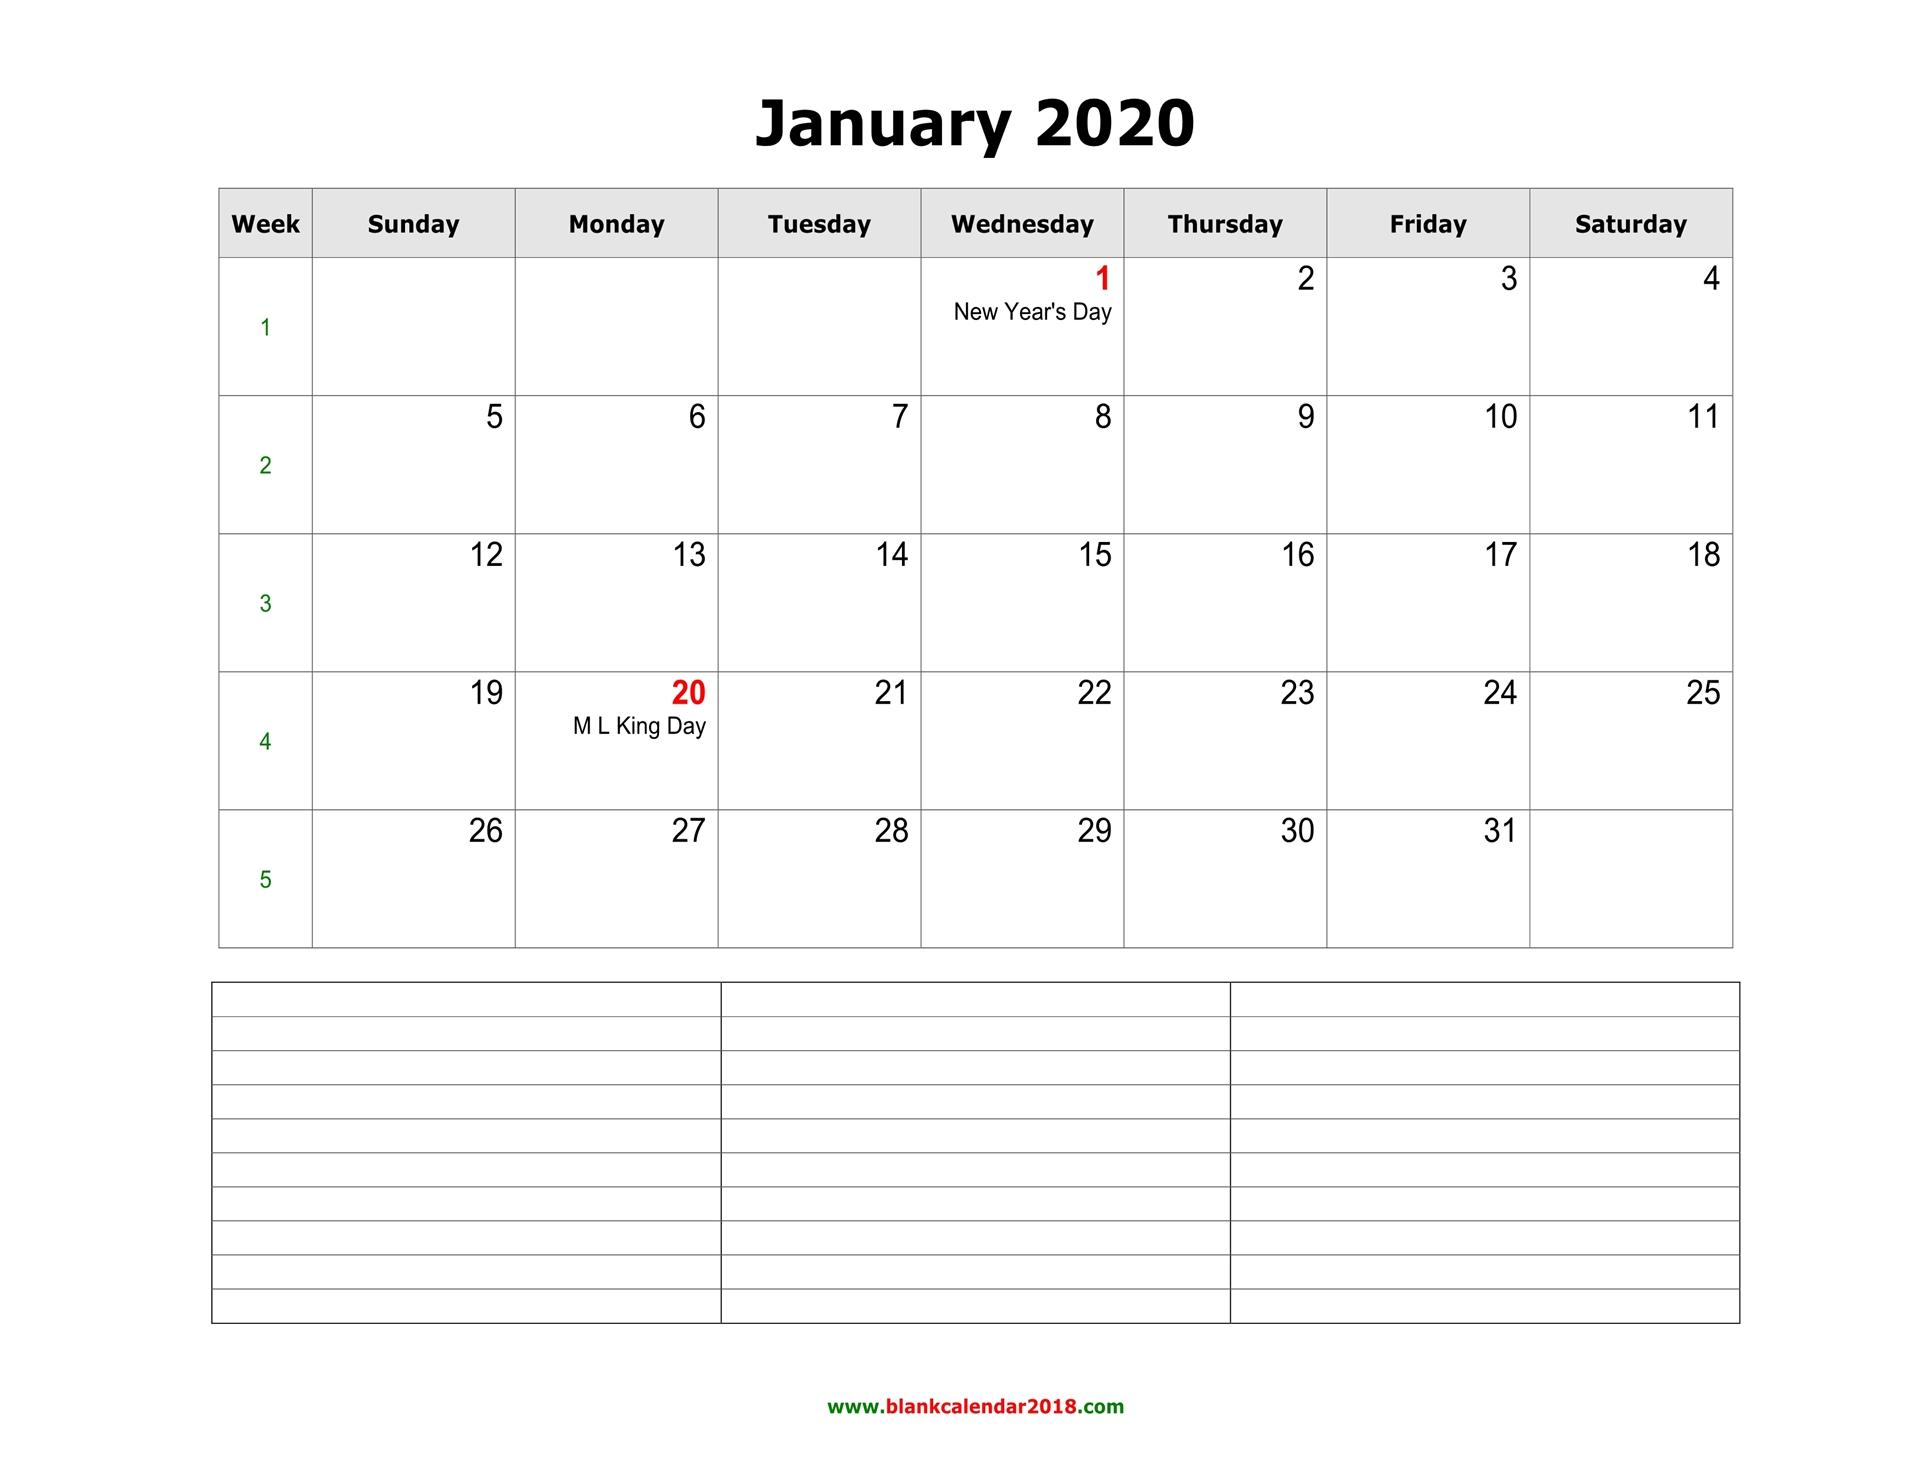 2020 Blank Calendar Template from www.blankcalendar2018.com